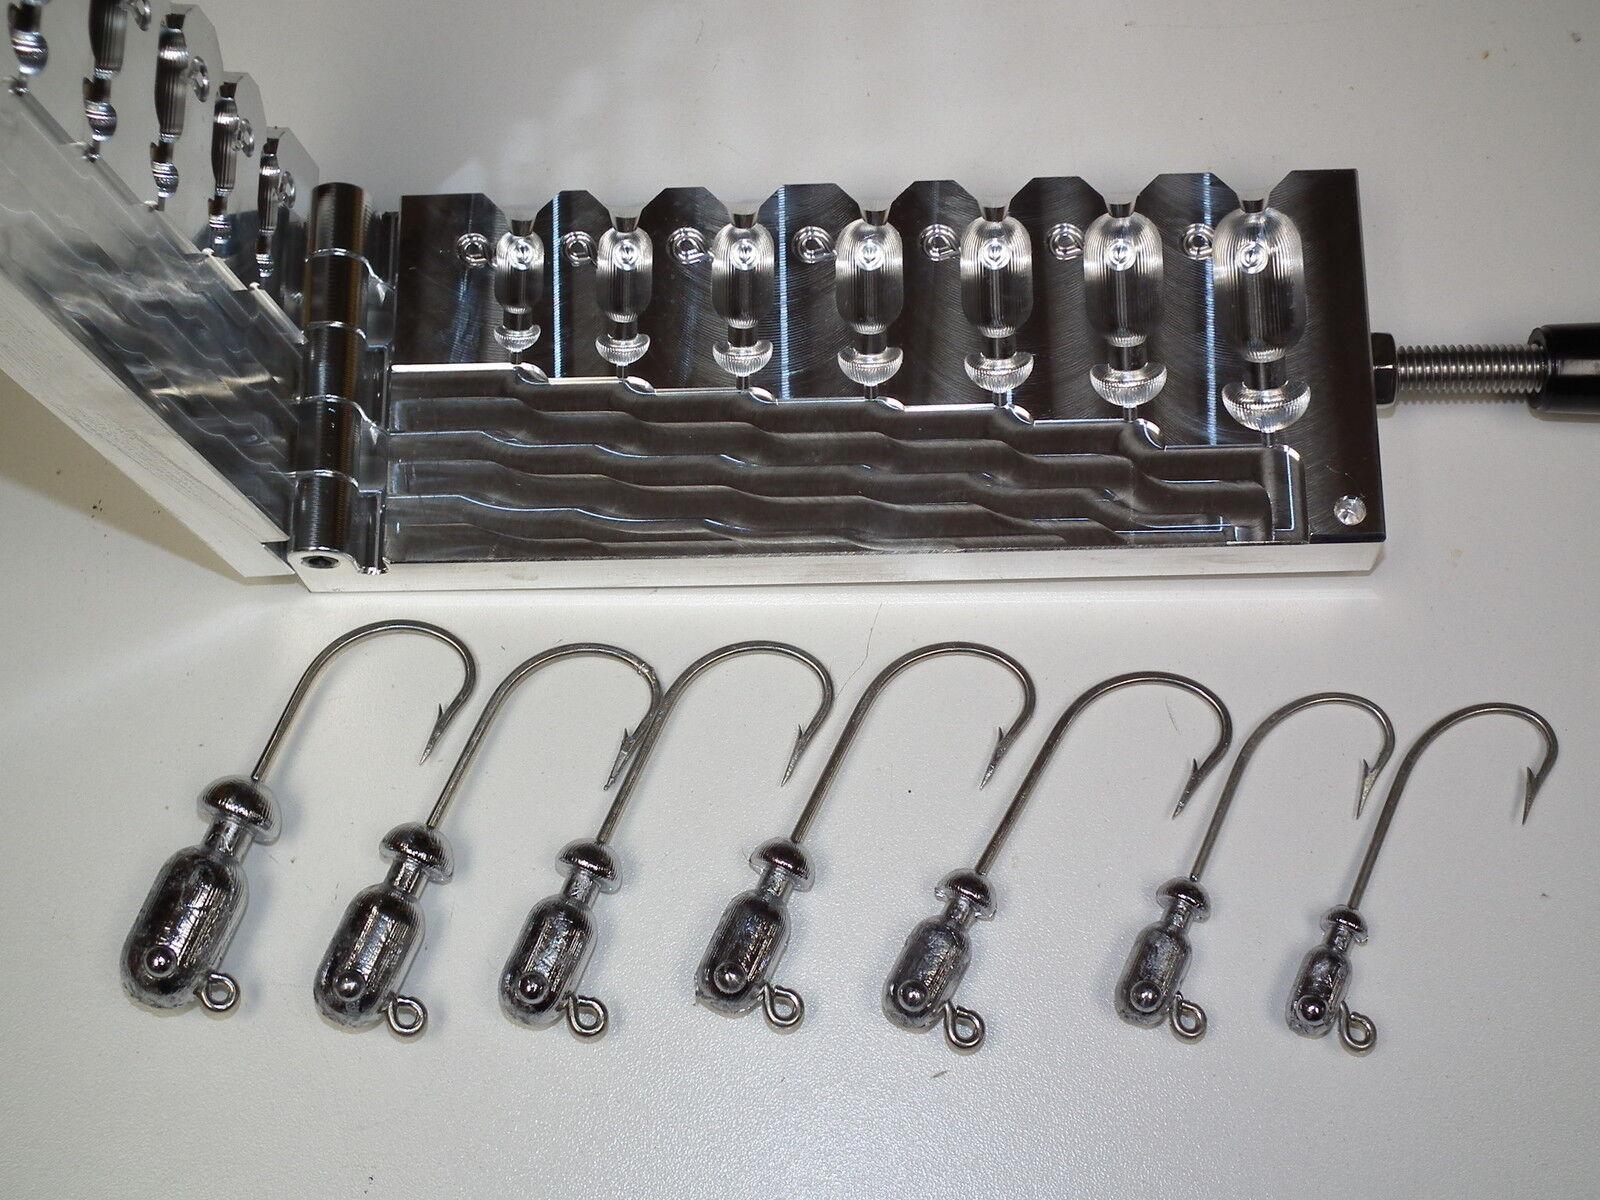 Saltwaterkugel Jig -3 Form 1  2 -3oz CNC Aluminium Flair Snook